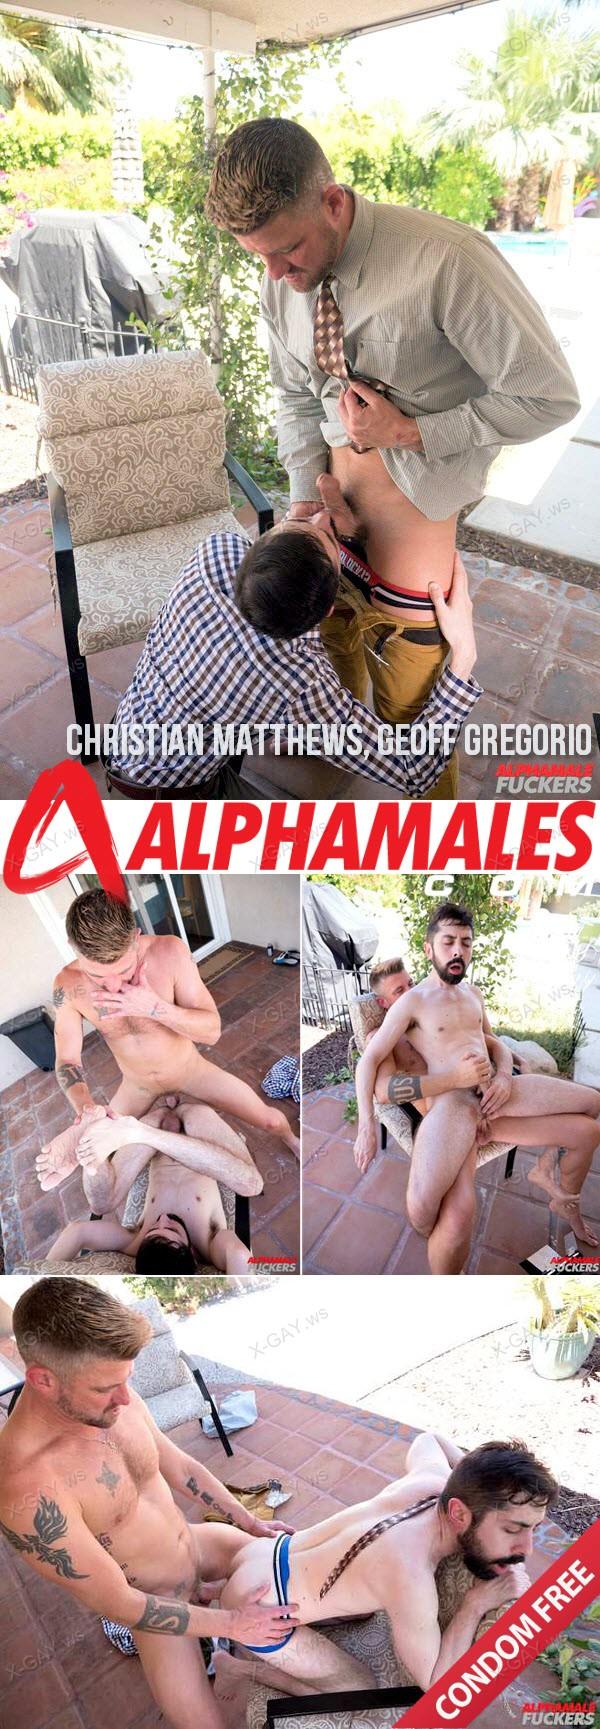 alphamales_christianmatthews_geoffgregorio.jpg